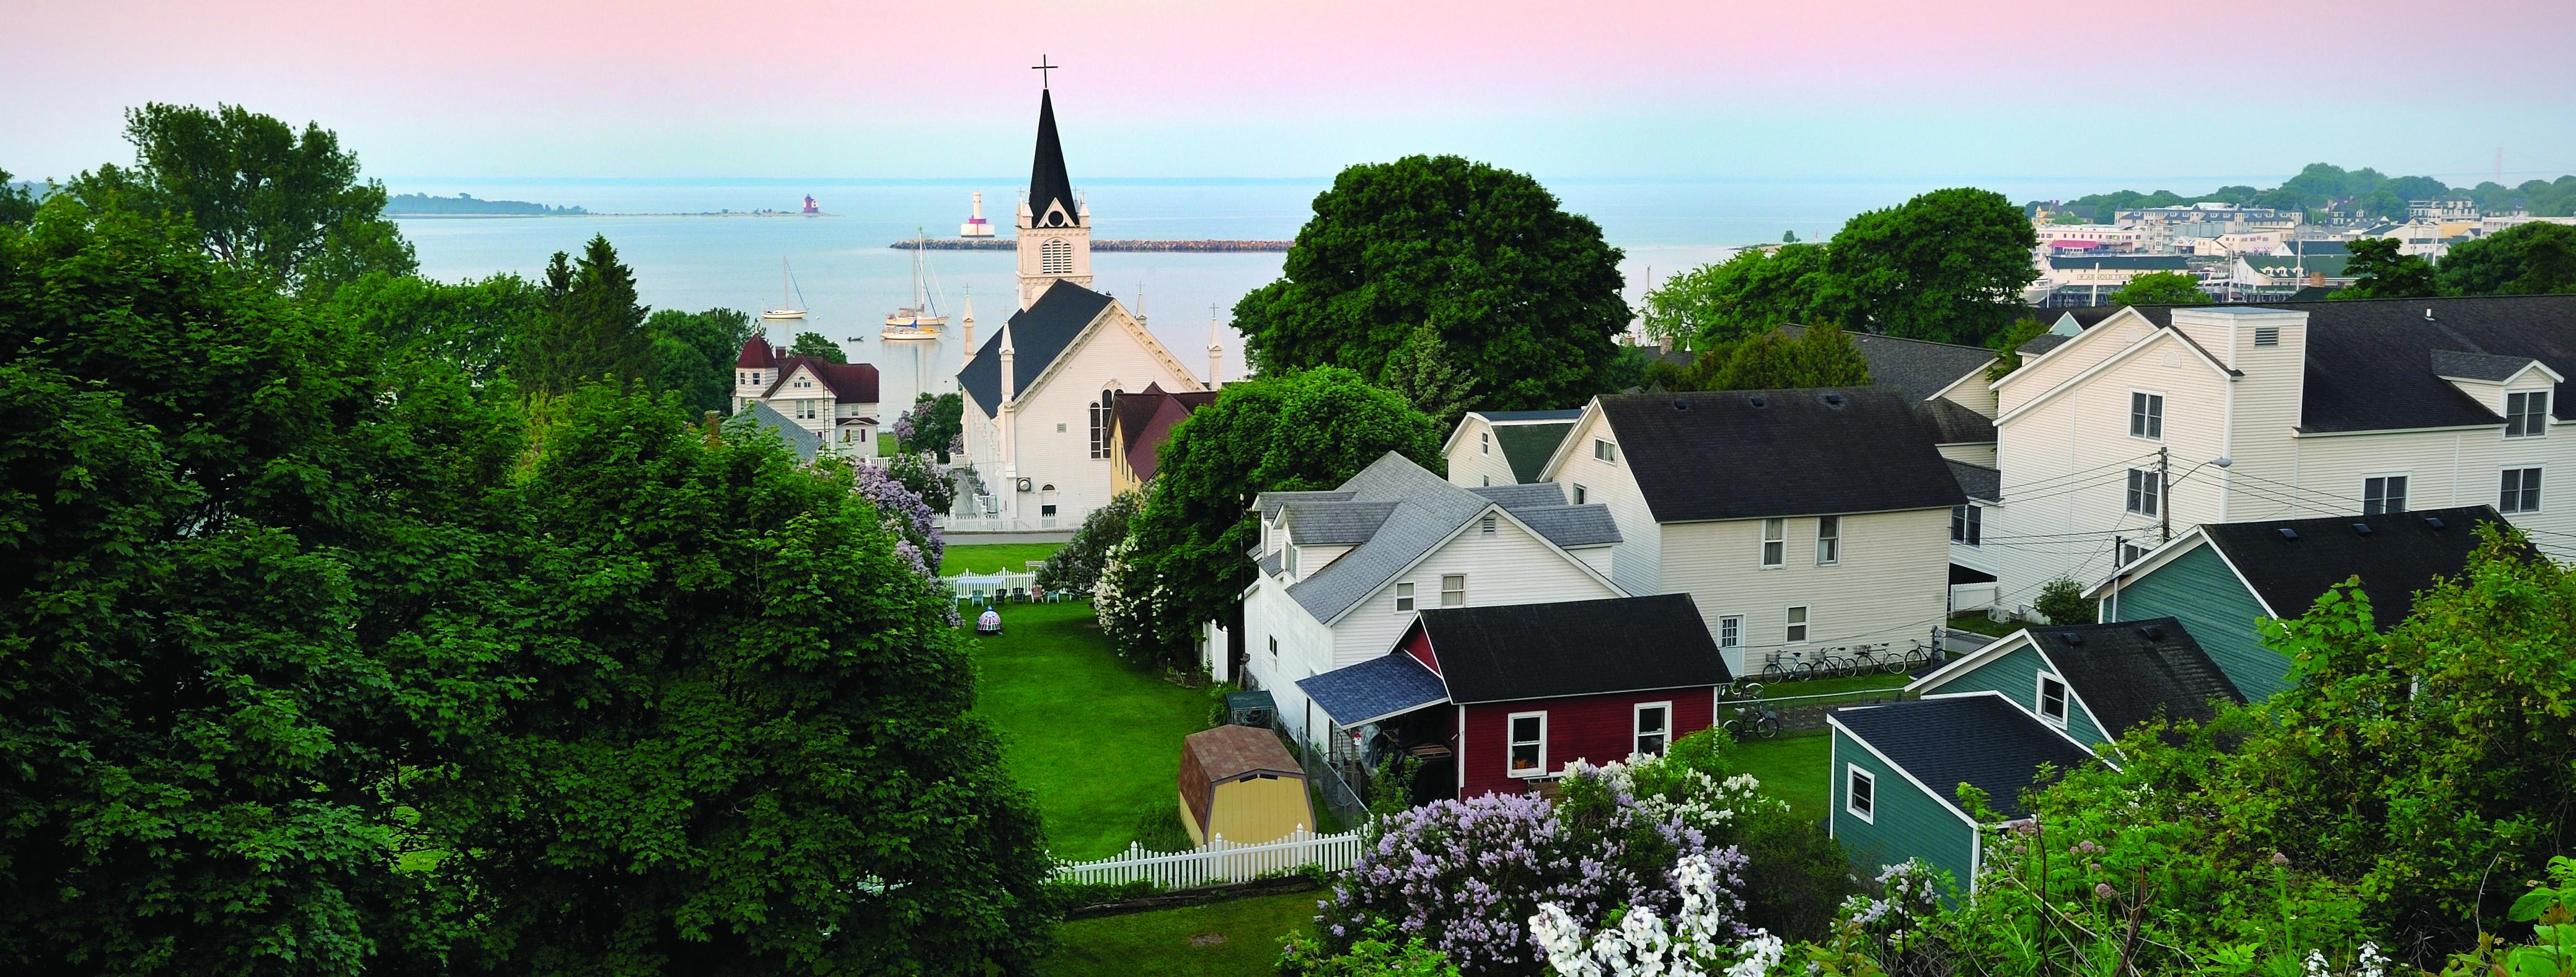 Ariel view of Mackinac island, quaint homes and churches.